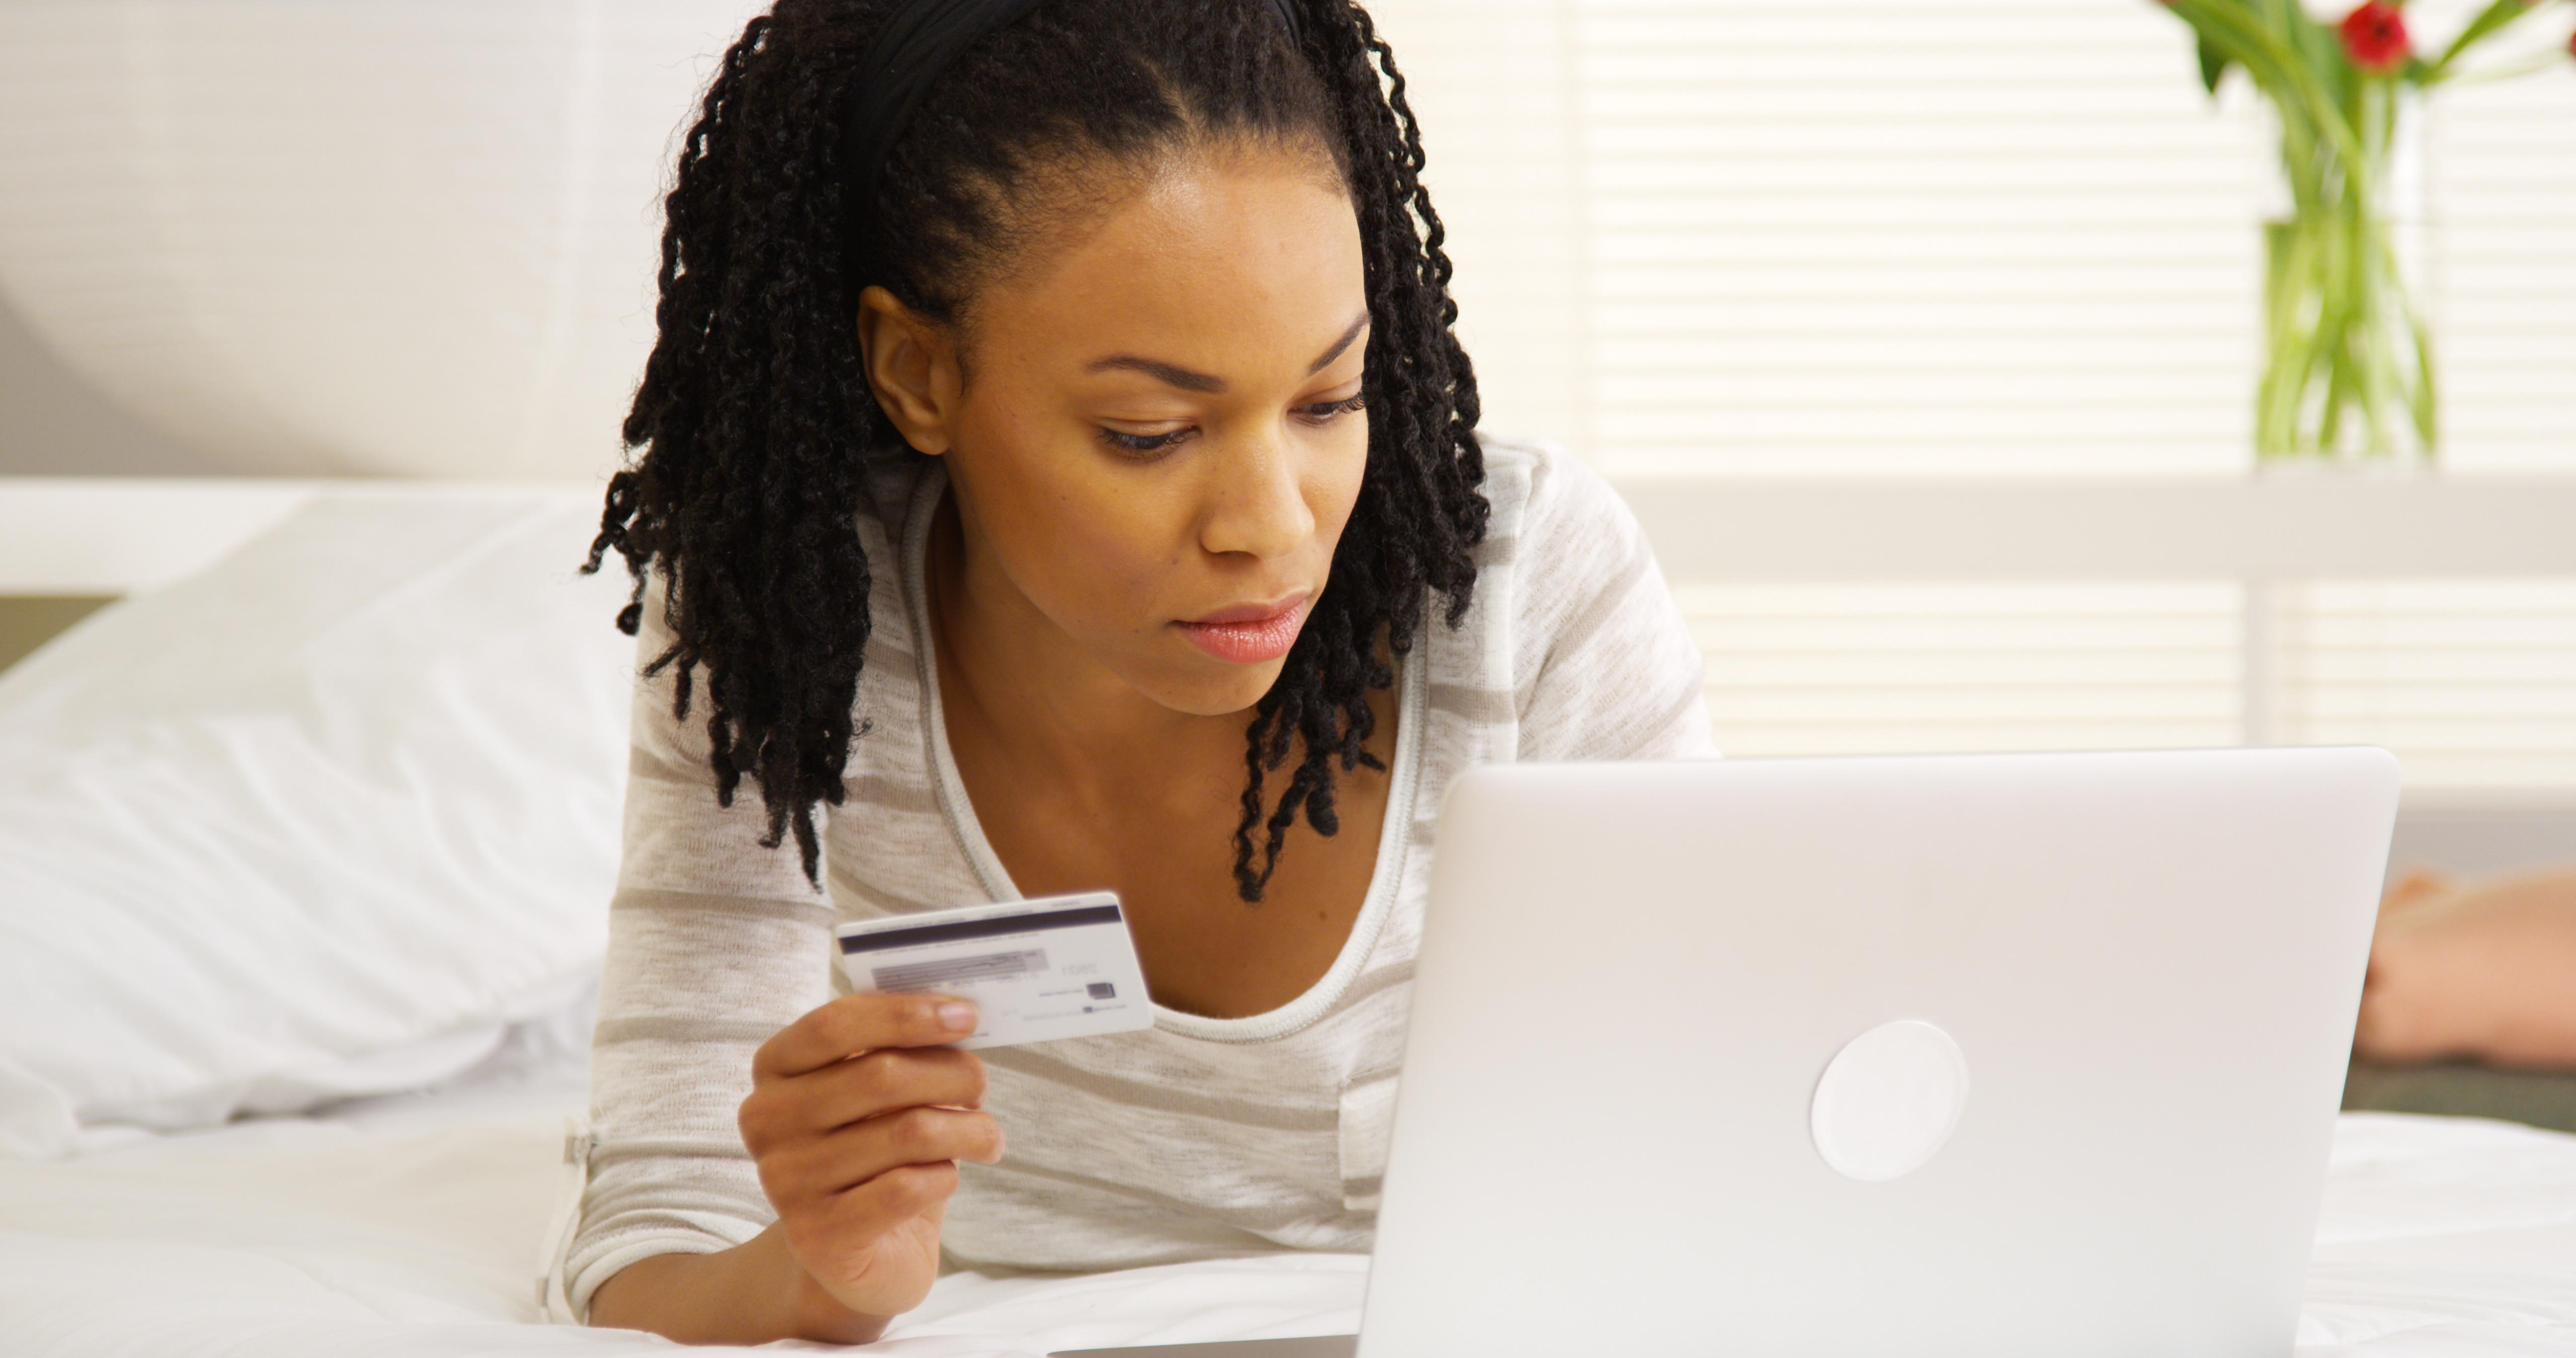 Women shopping online with debit card